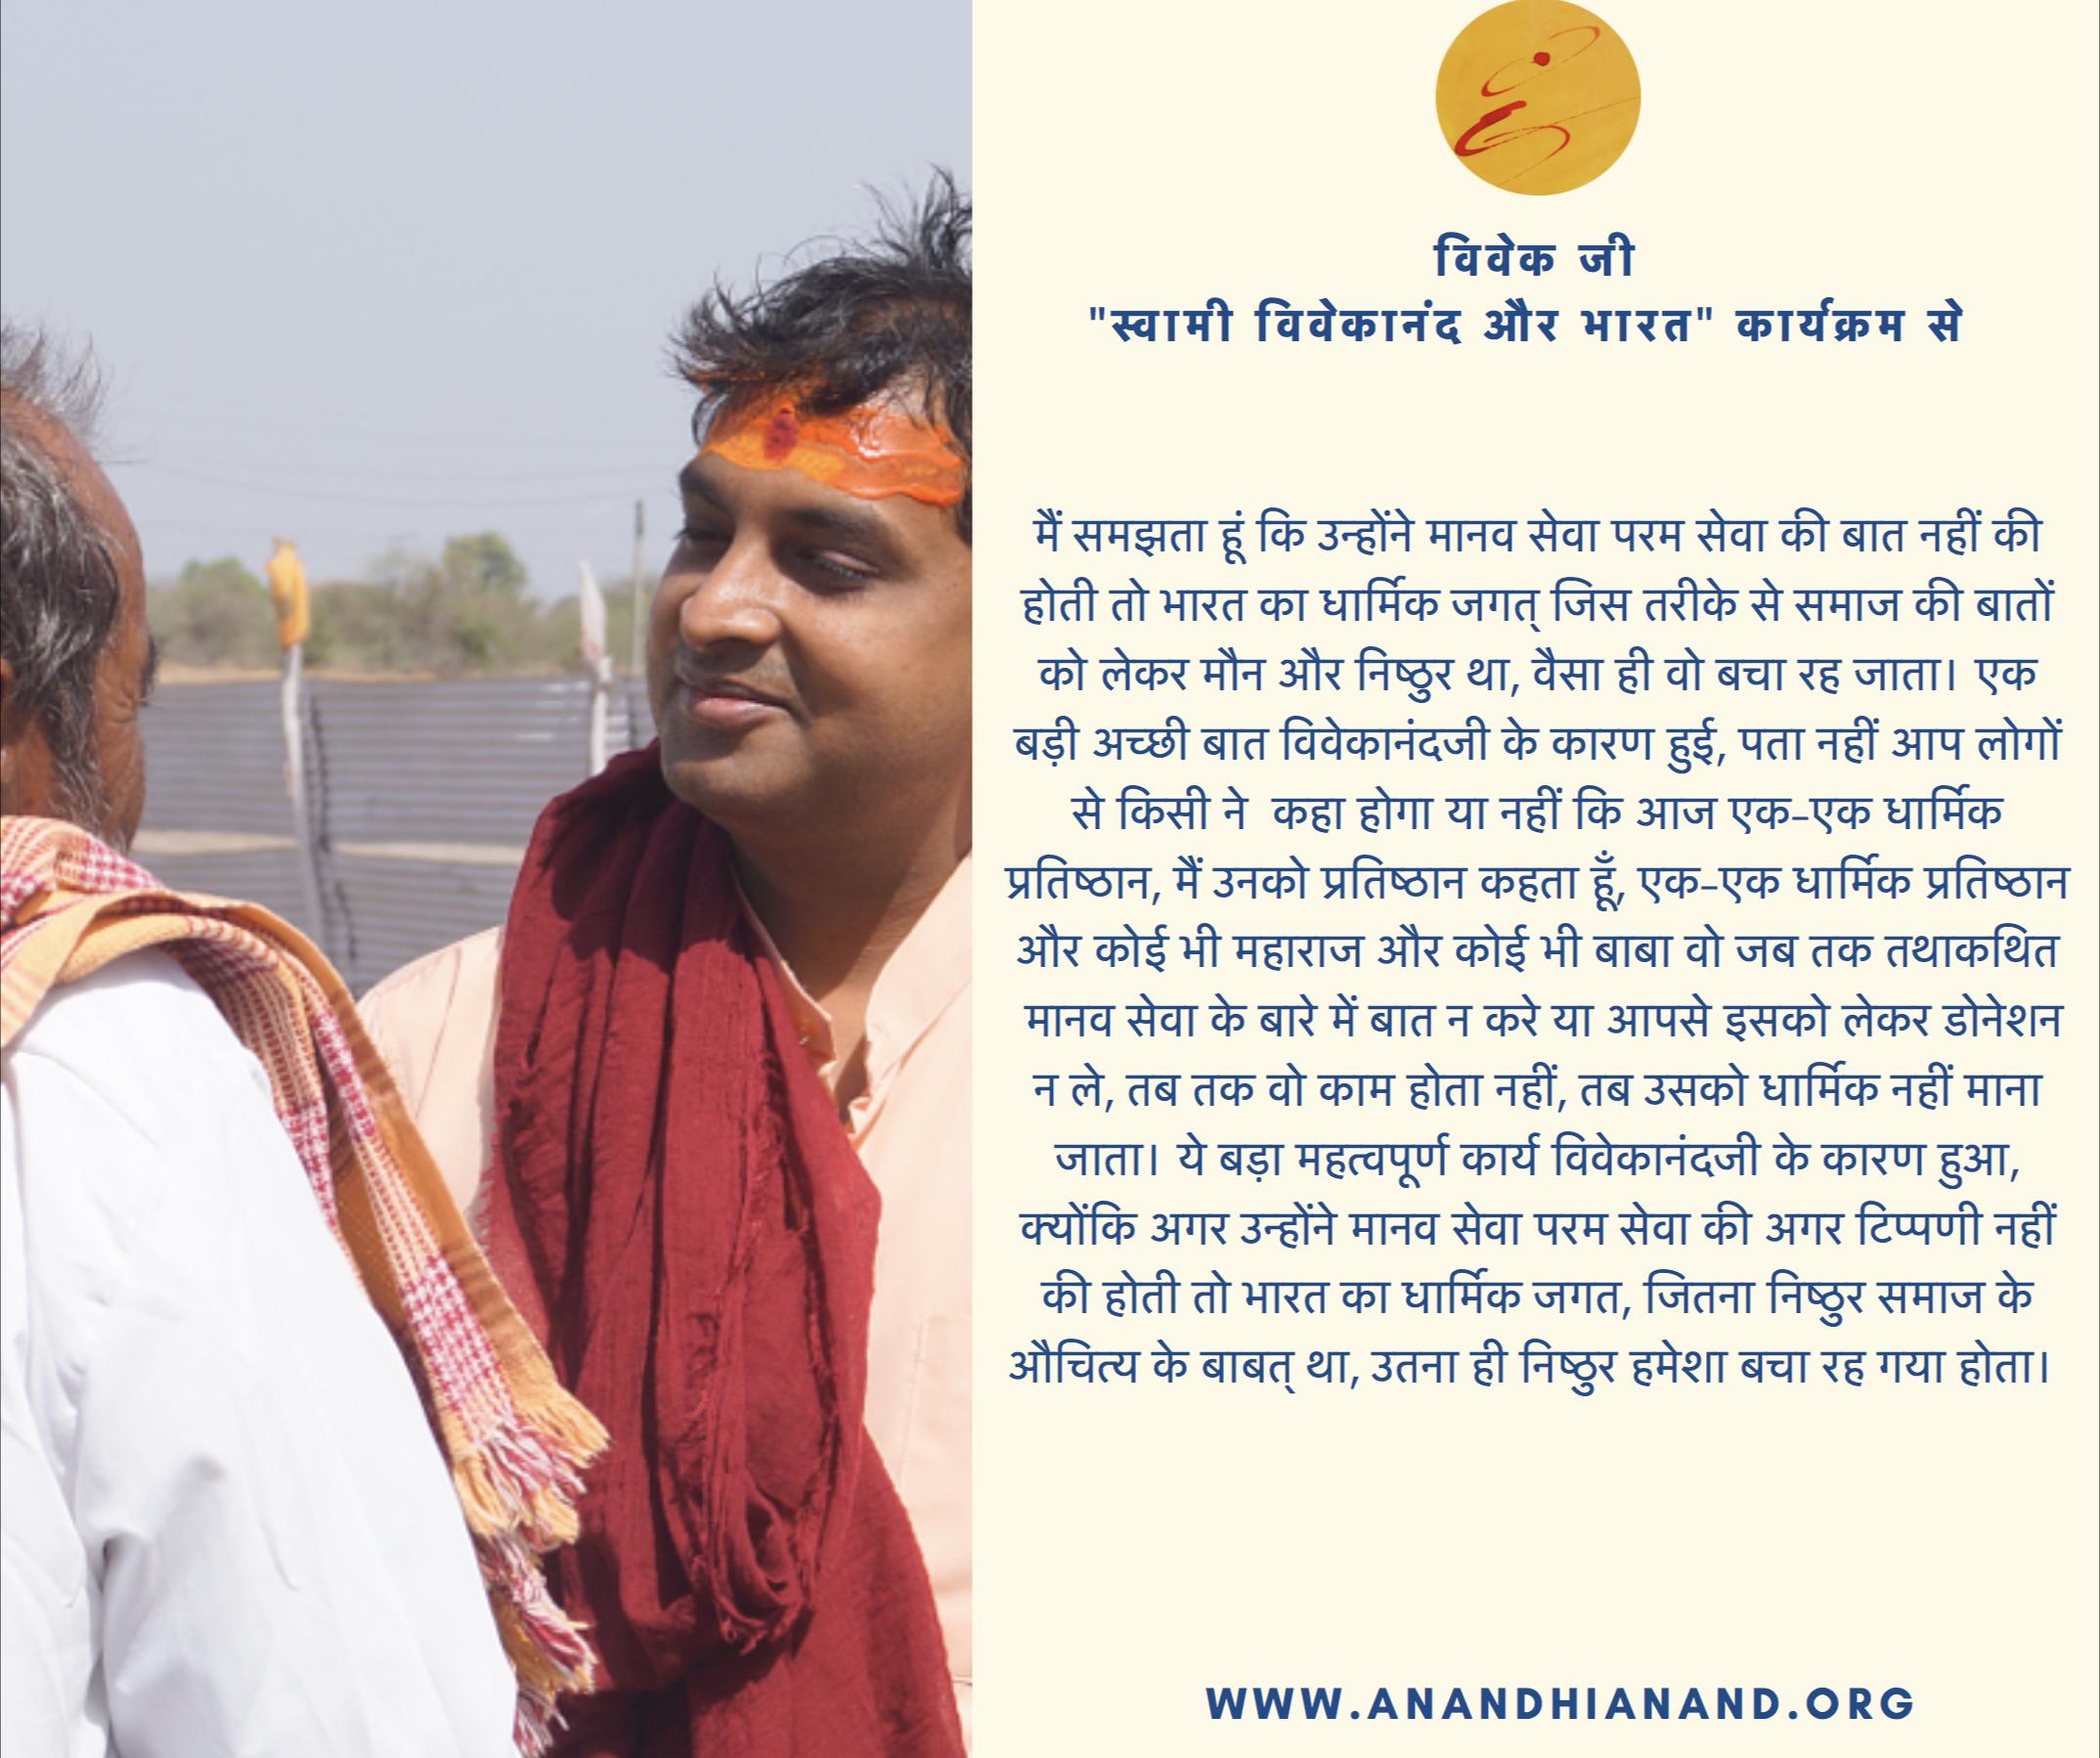 Swami ji and service